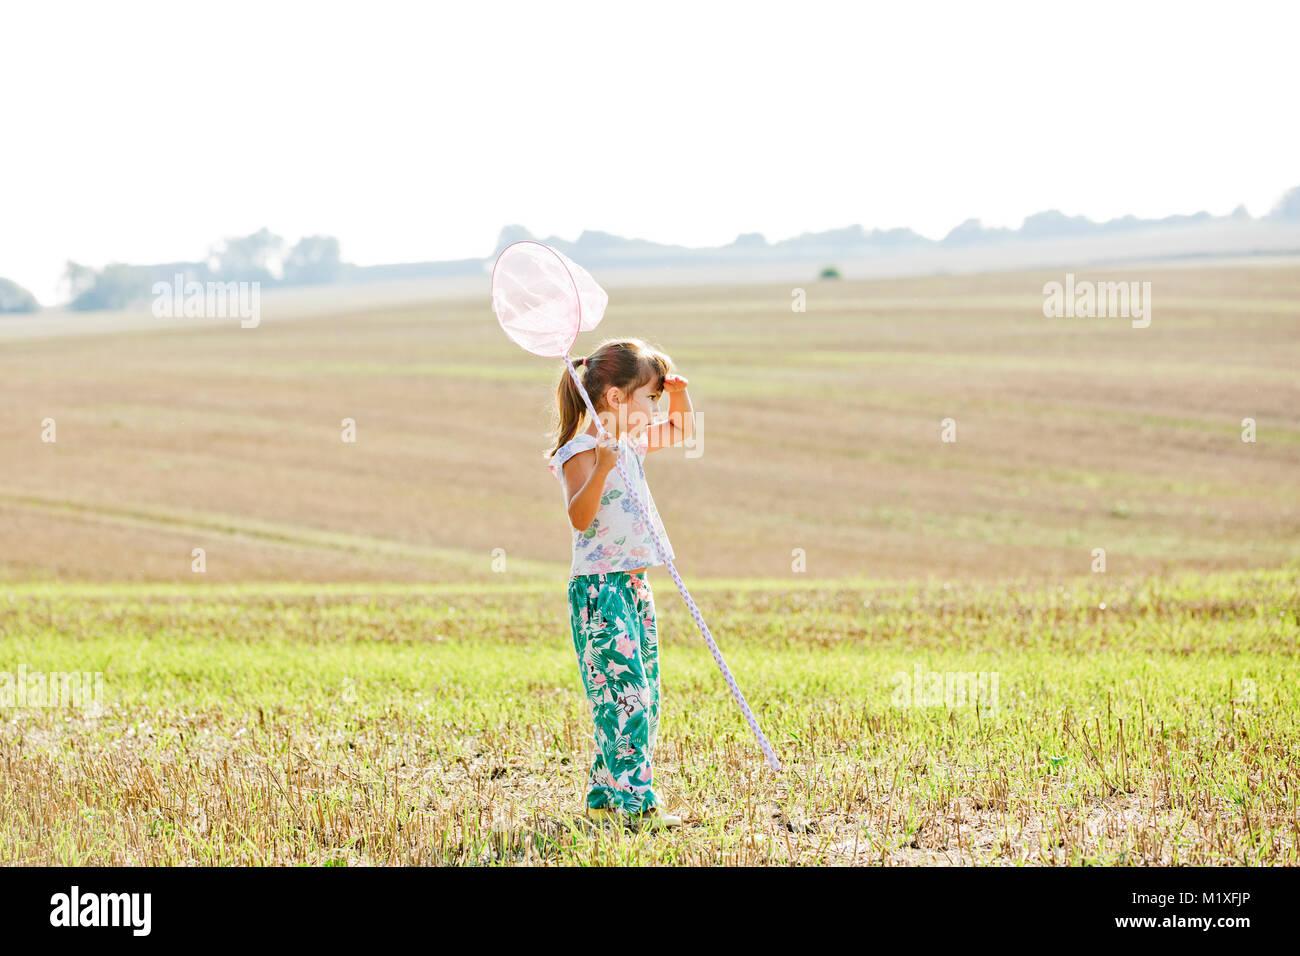 Girl with bug net in field in Friseboda, Sweden - Stock Image